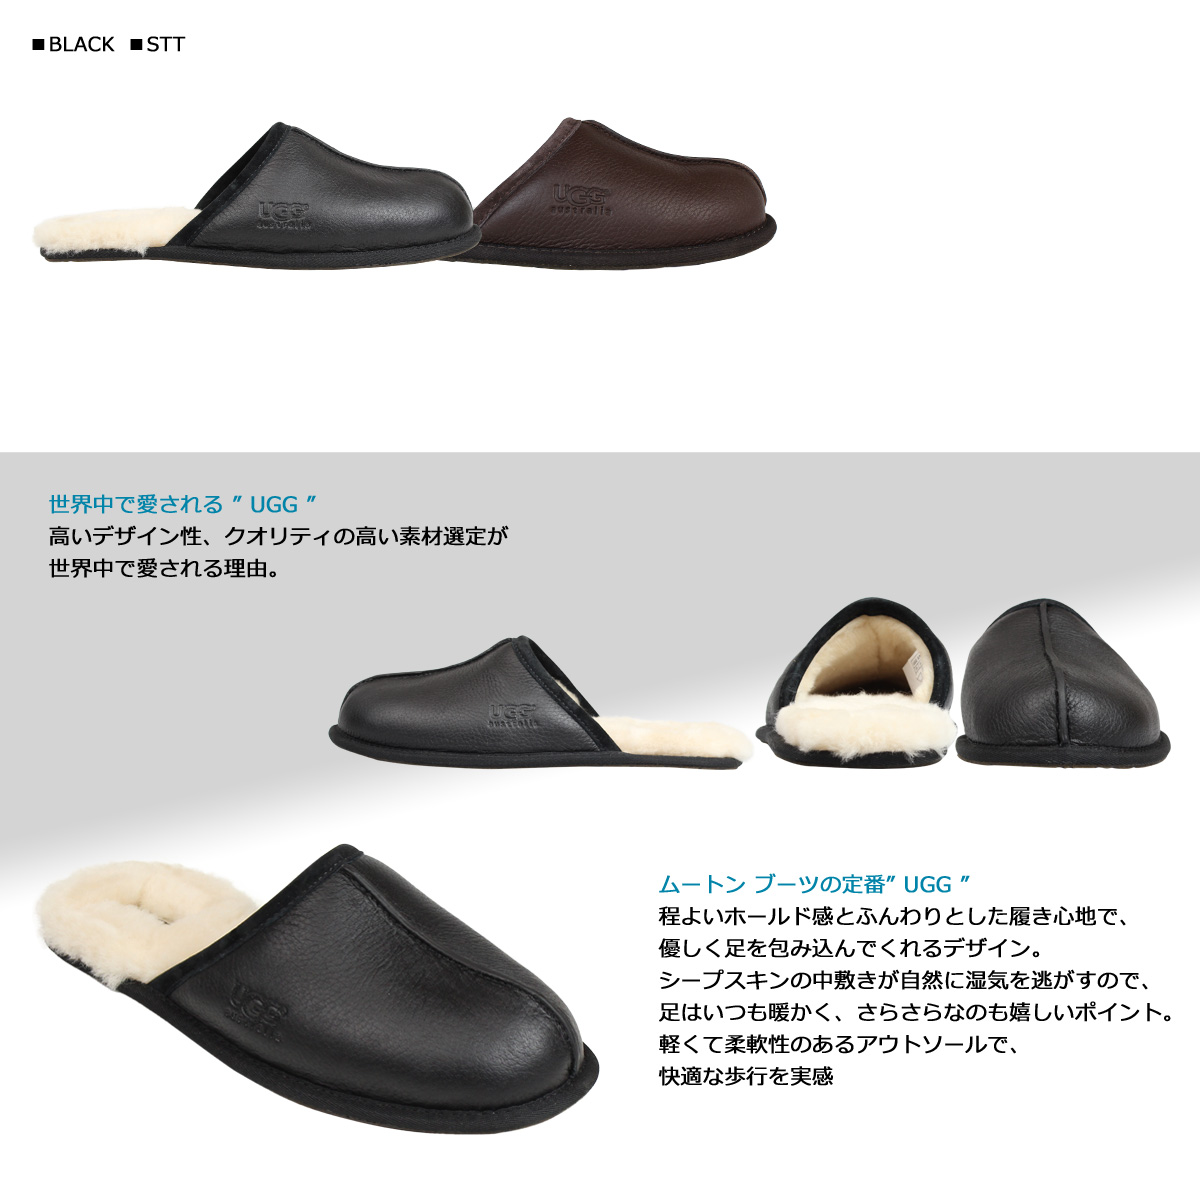 95f9acd6a84 UGG UGG mens MENS SCUFF slippers scuff 1001546 black [9/30 new in stock]